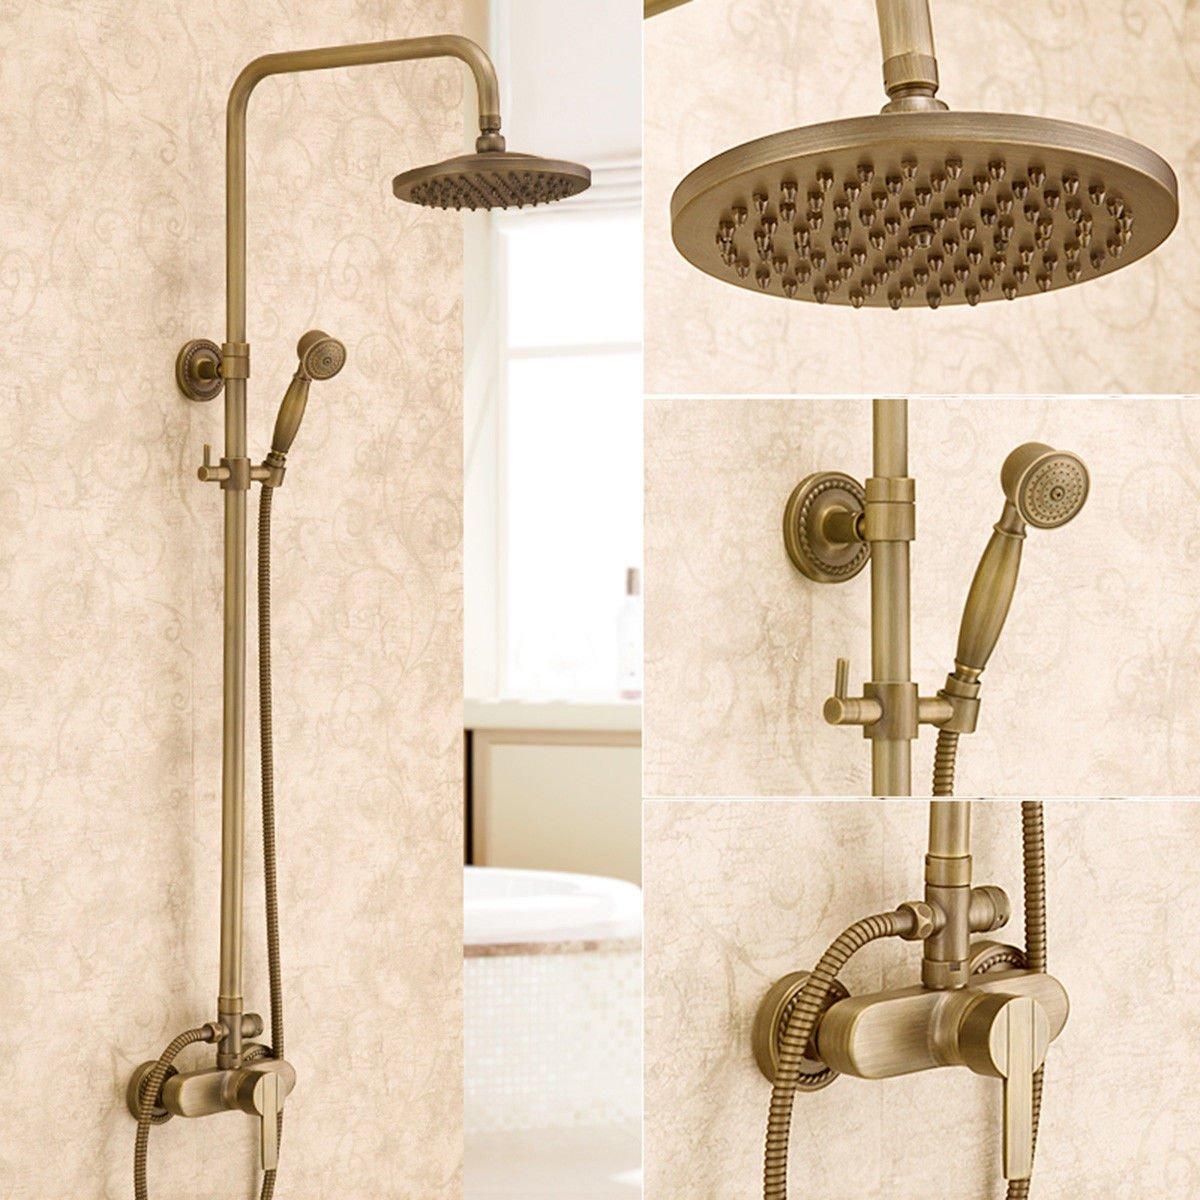 SADASD Contemporary Bathroom Full Copper Basin Faucet Mixer Shower Basin Sink Mixer Tap Ceramic Valve Single Hole Single Handle Cold Water With G1 2 Hose